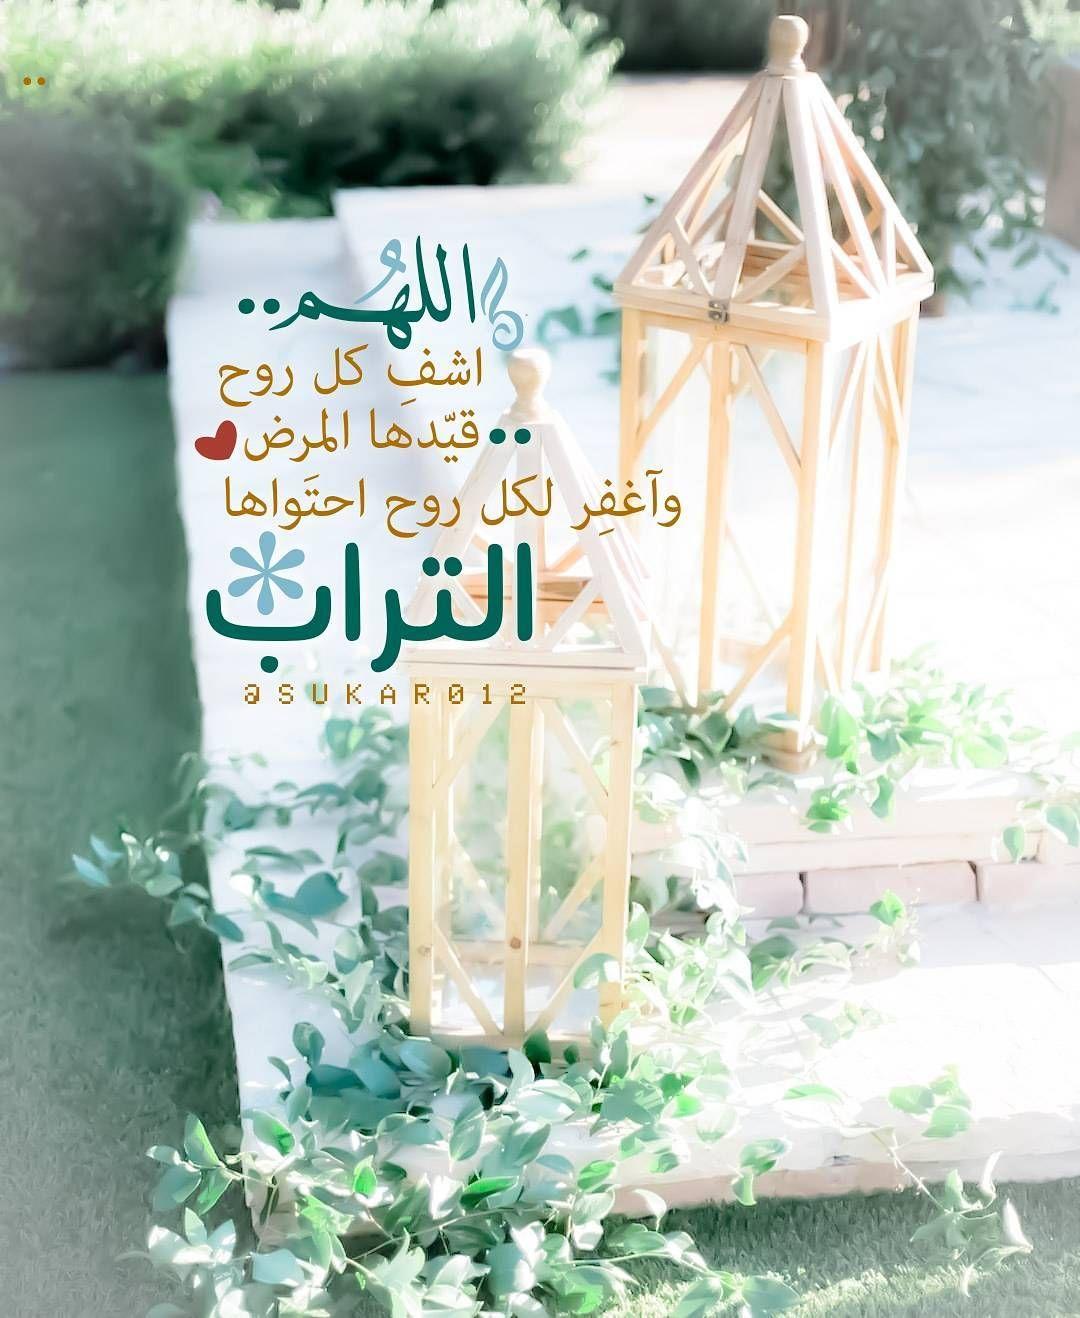 اللهم اشف كل روح قيدها المرض واغفر لكل روح احتواها التراب Words Of Wisdom Quotes Islamic Pictures Quran Verses